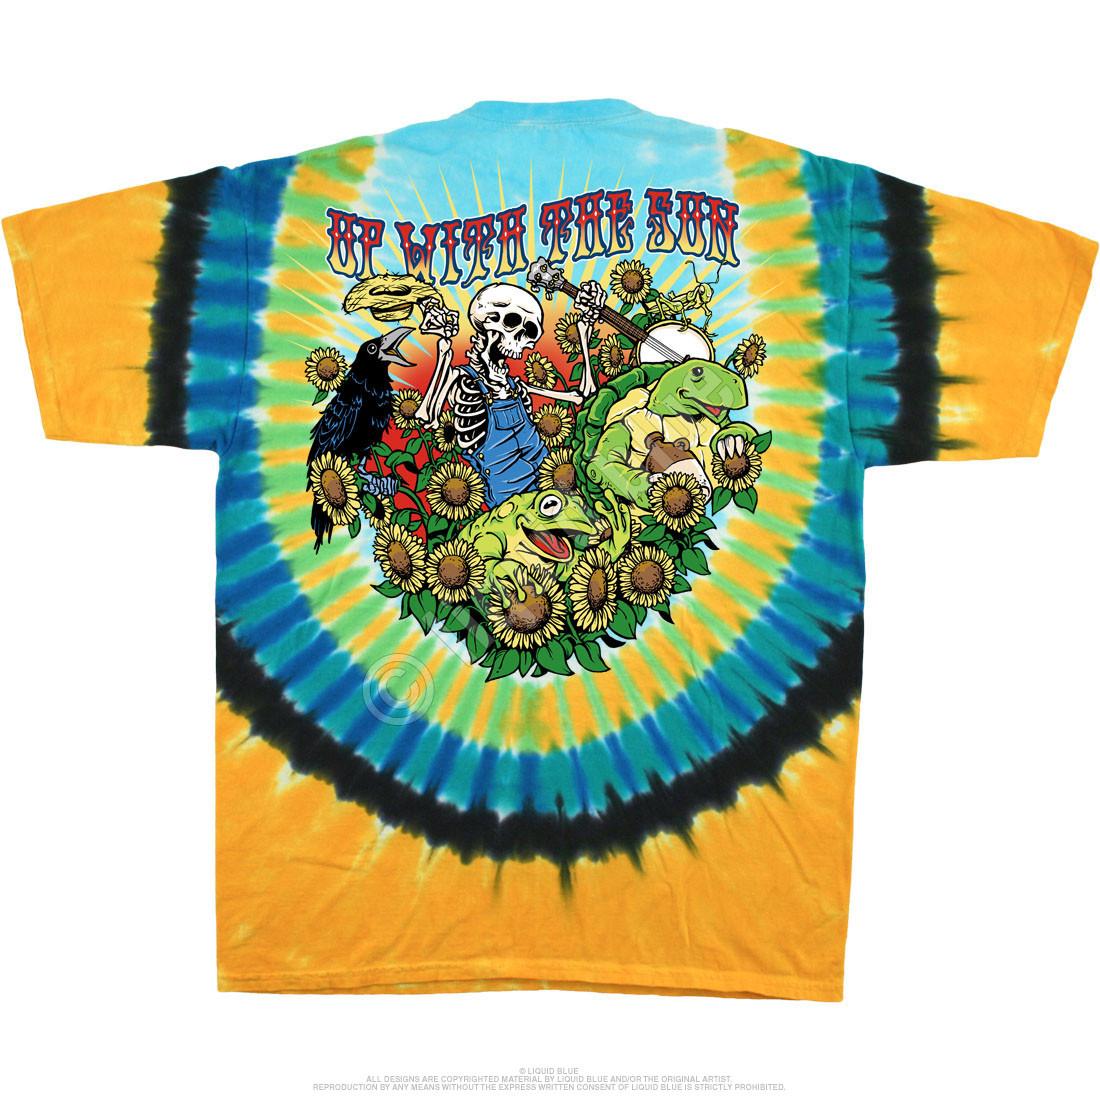 Sunrise Jam Tie-Dye T-Shirt